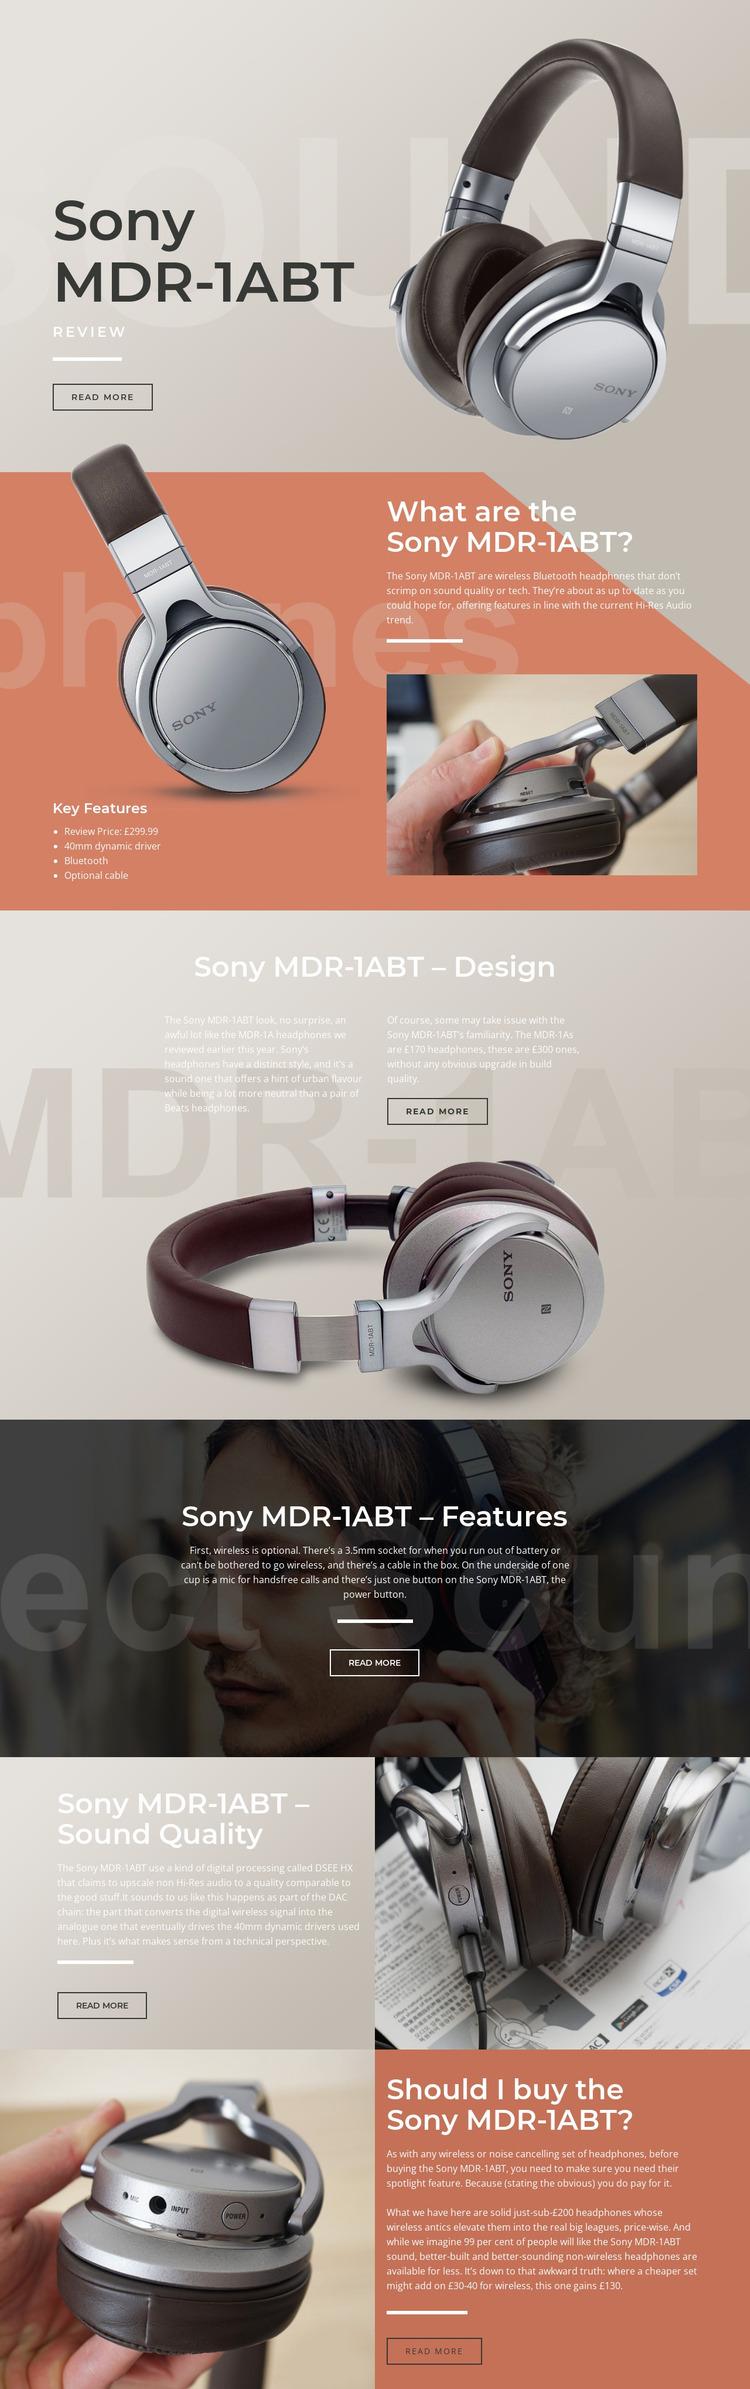 Listening your favorite music Html Website Builder